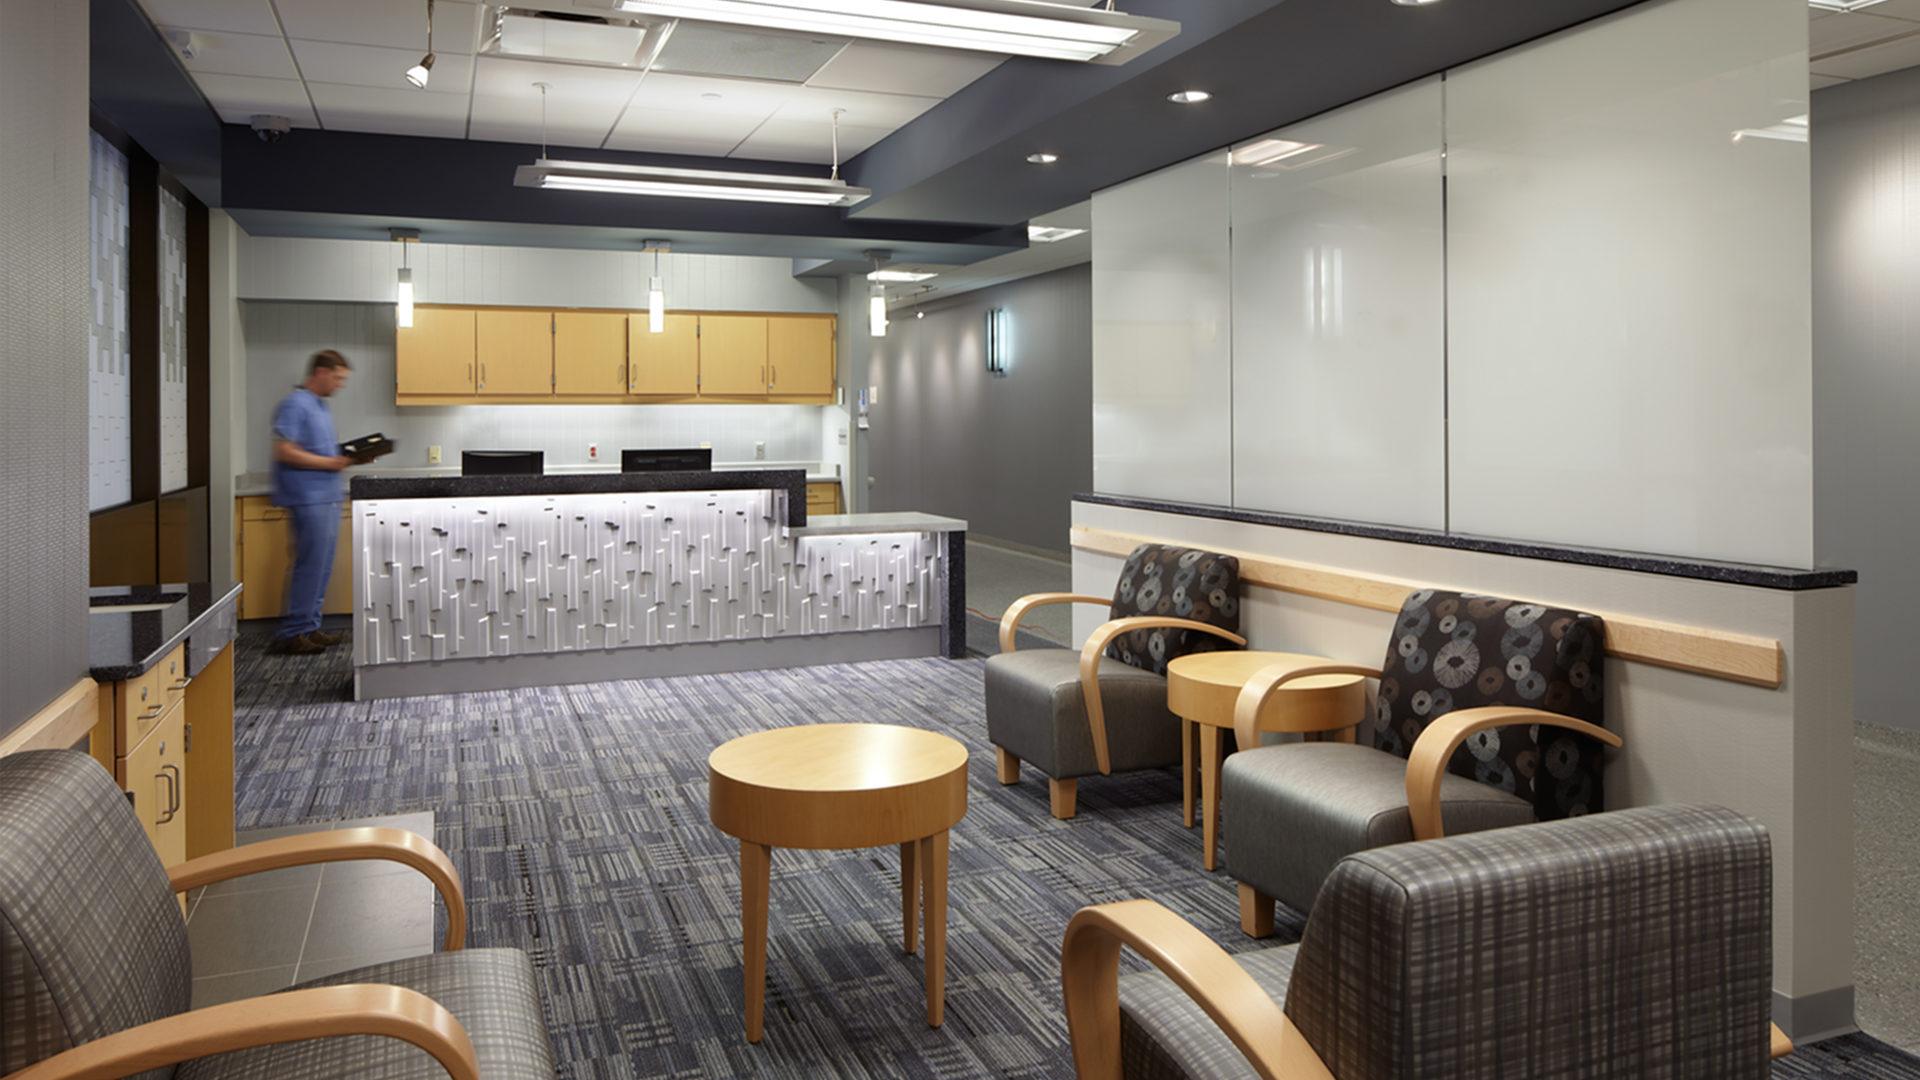 HCMC Hyperbaric Chamber Interior Lobby Featuring Beautiful Reception Desk